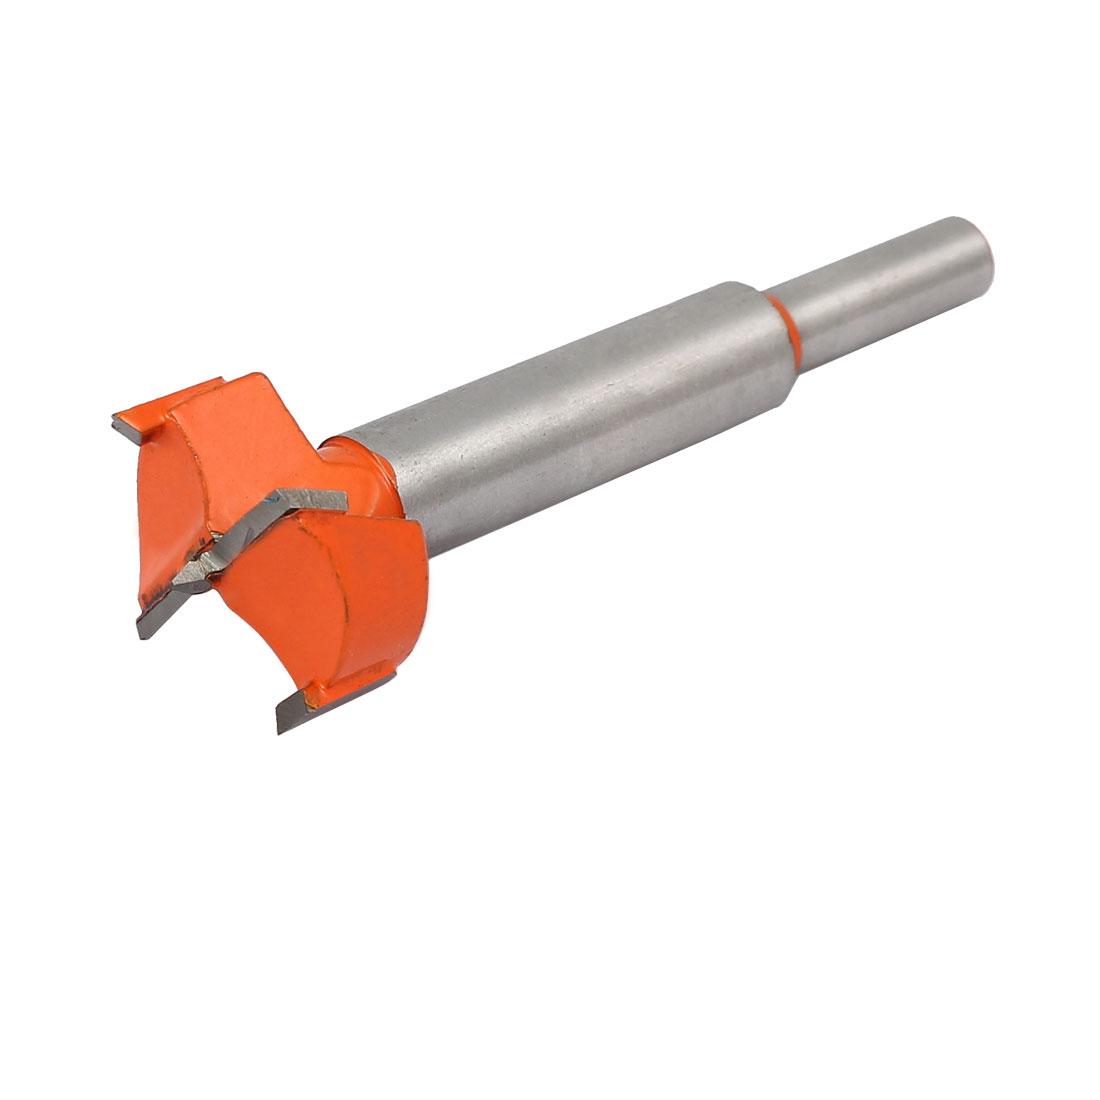 28mm Dia Carbide Tip Wood Drilling Cutting Hinge Boring Bit Drill Tool Orange